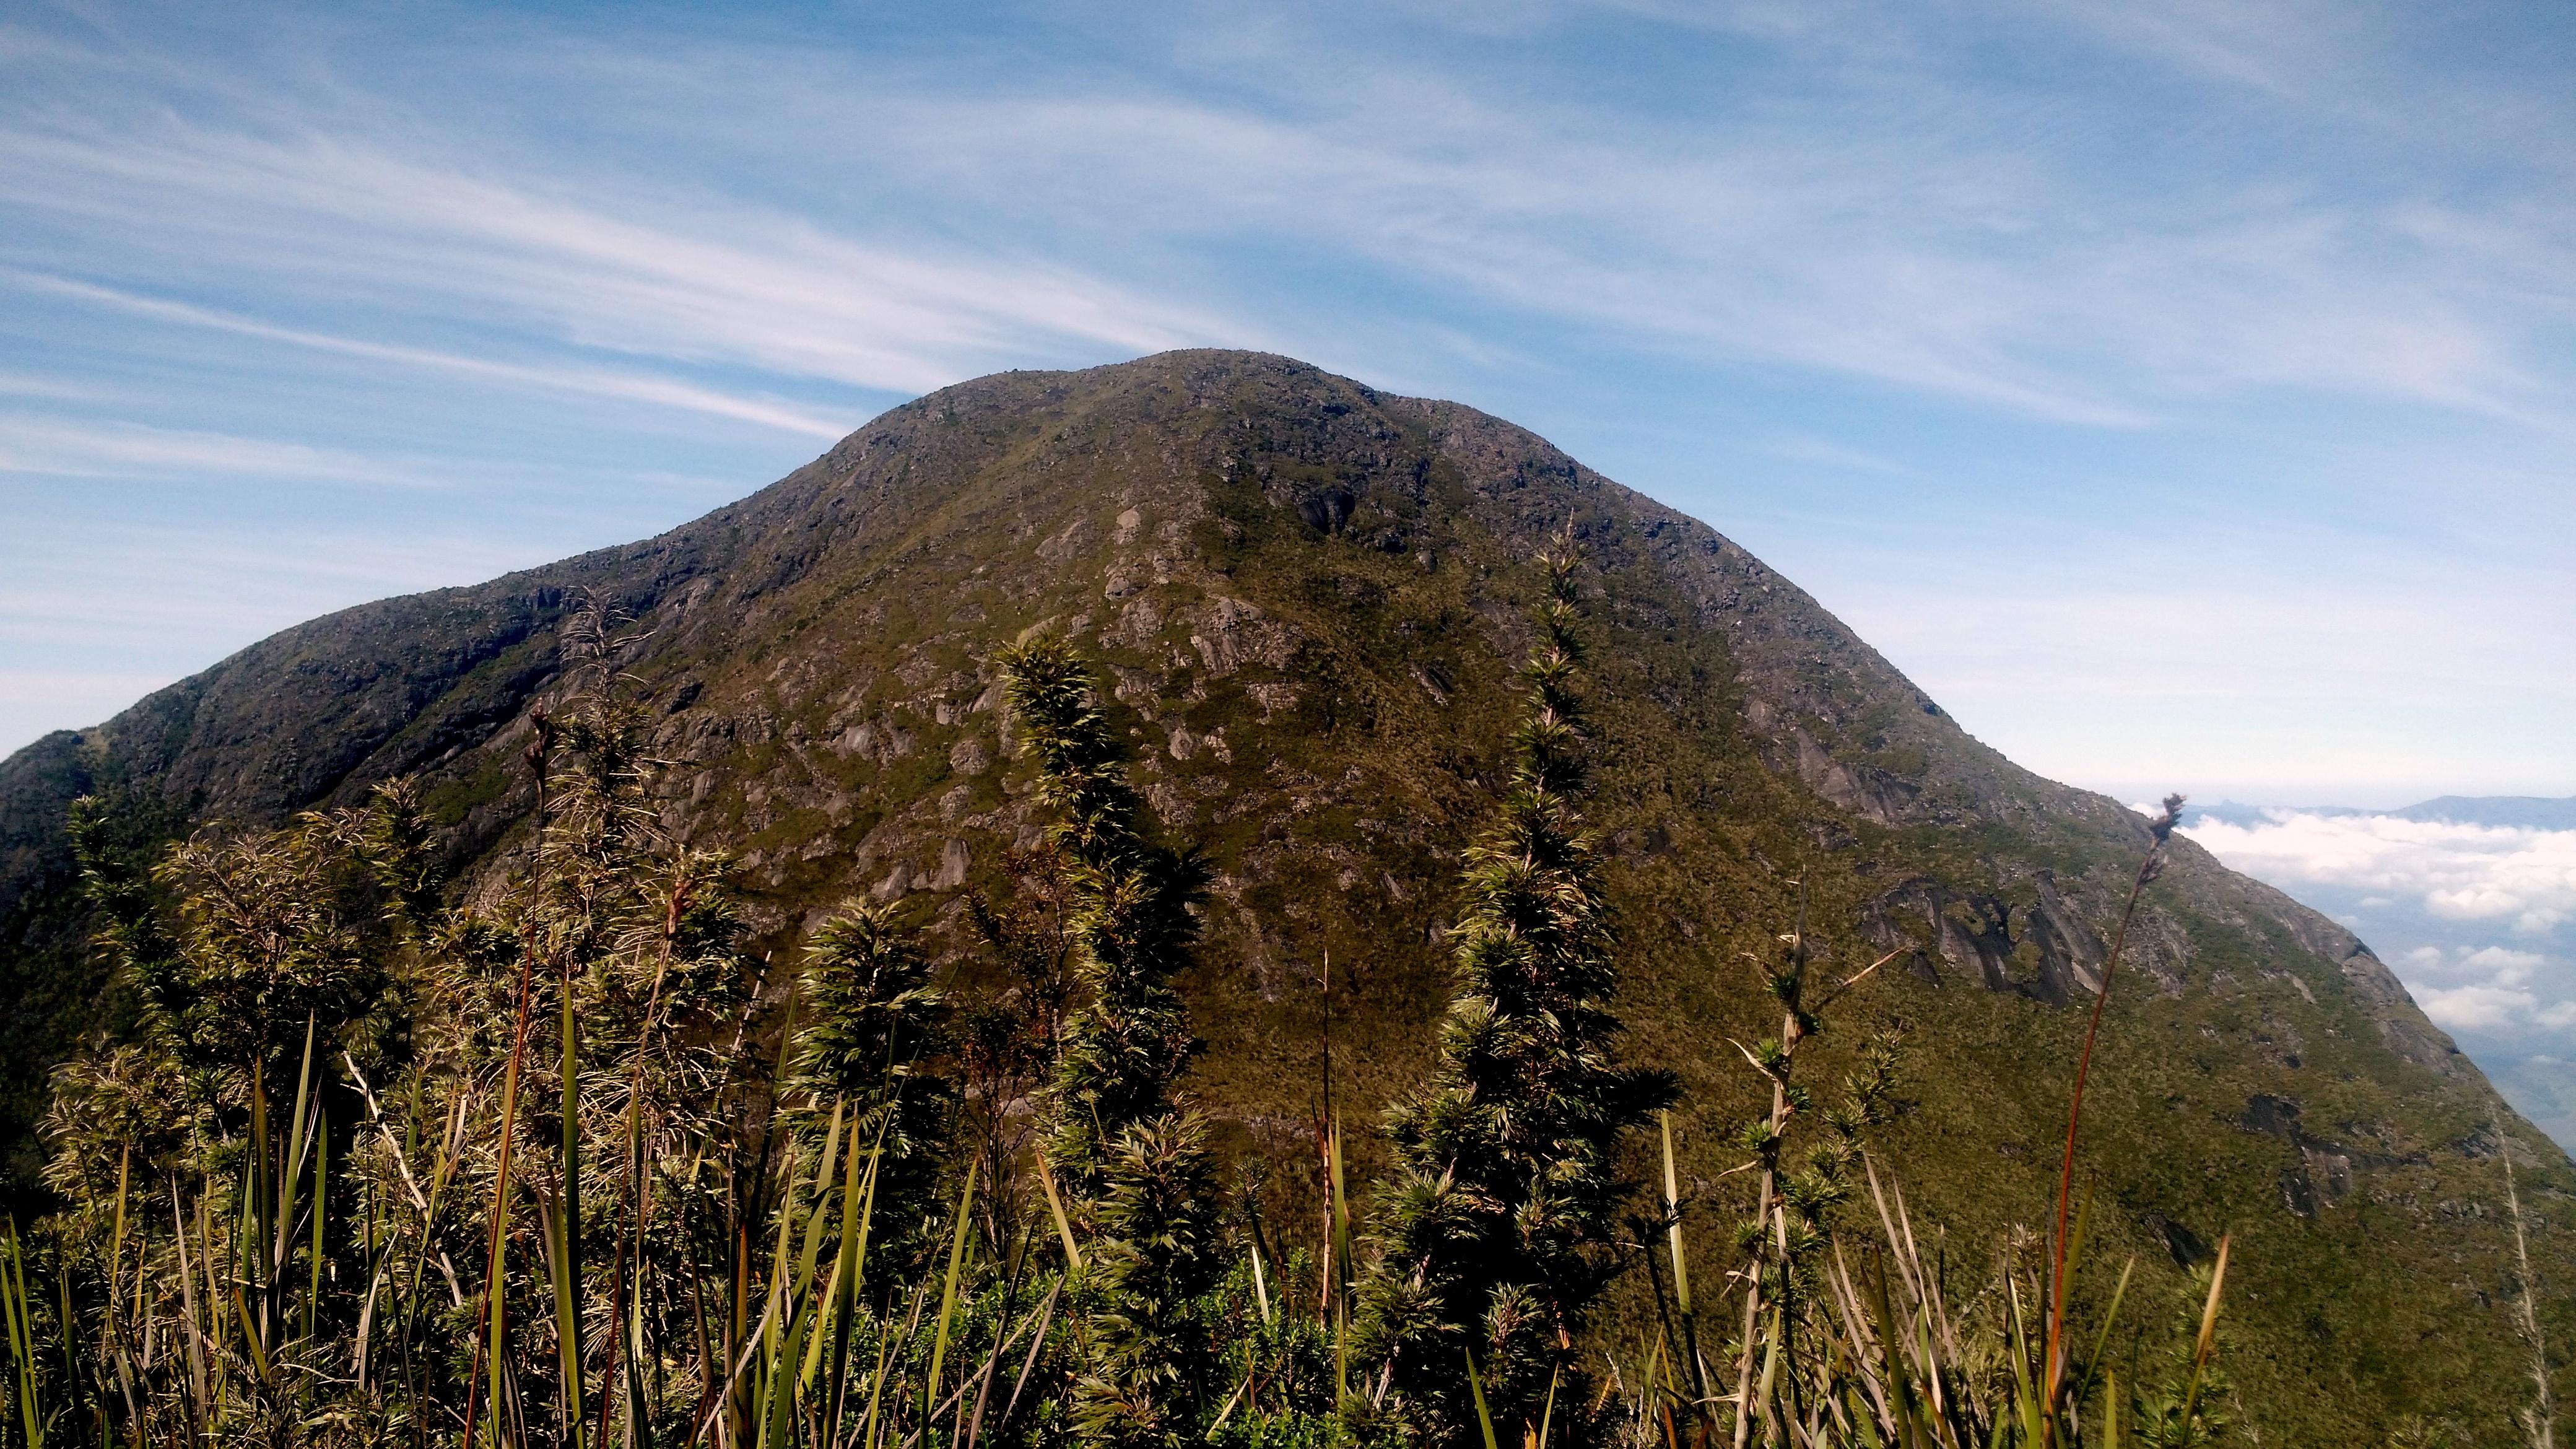 File:Pico da Cabeça de Touro.jpg - Wikimedia Commons